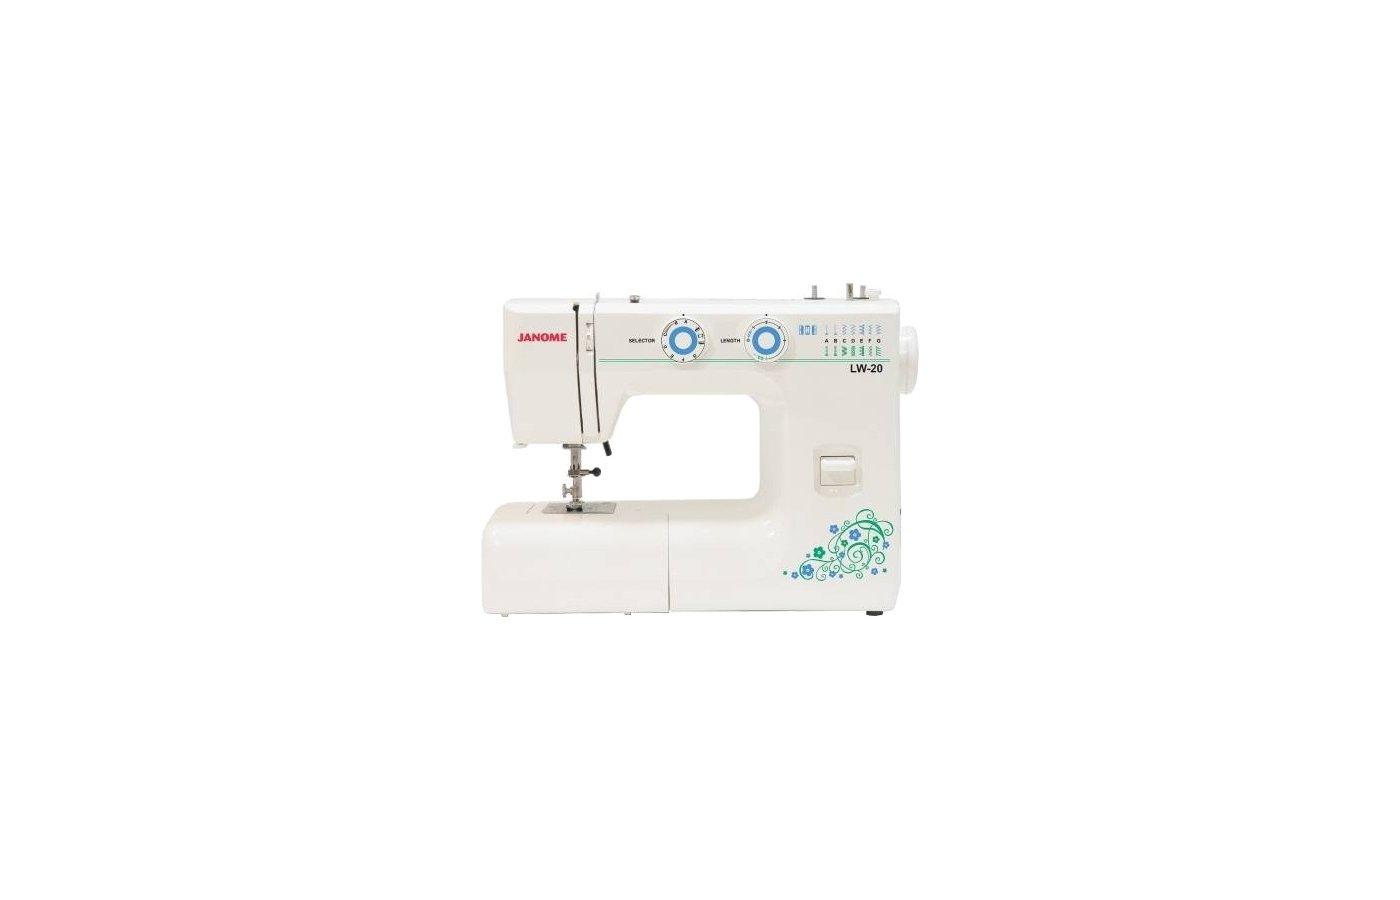 Швейная машина JANOME PS 19 (LW-20)